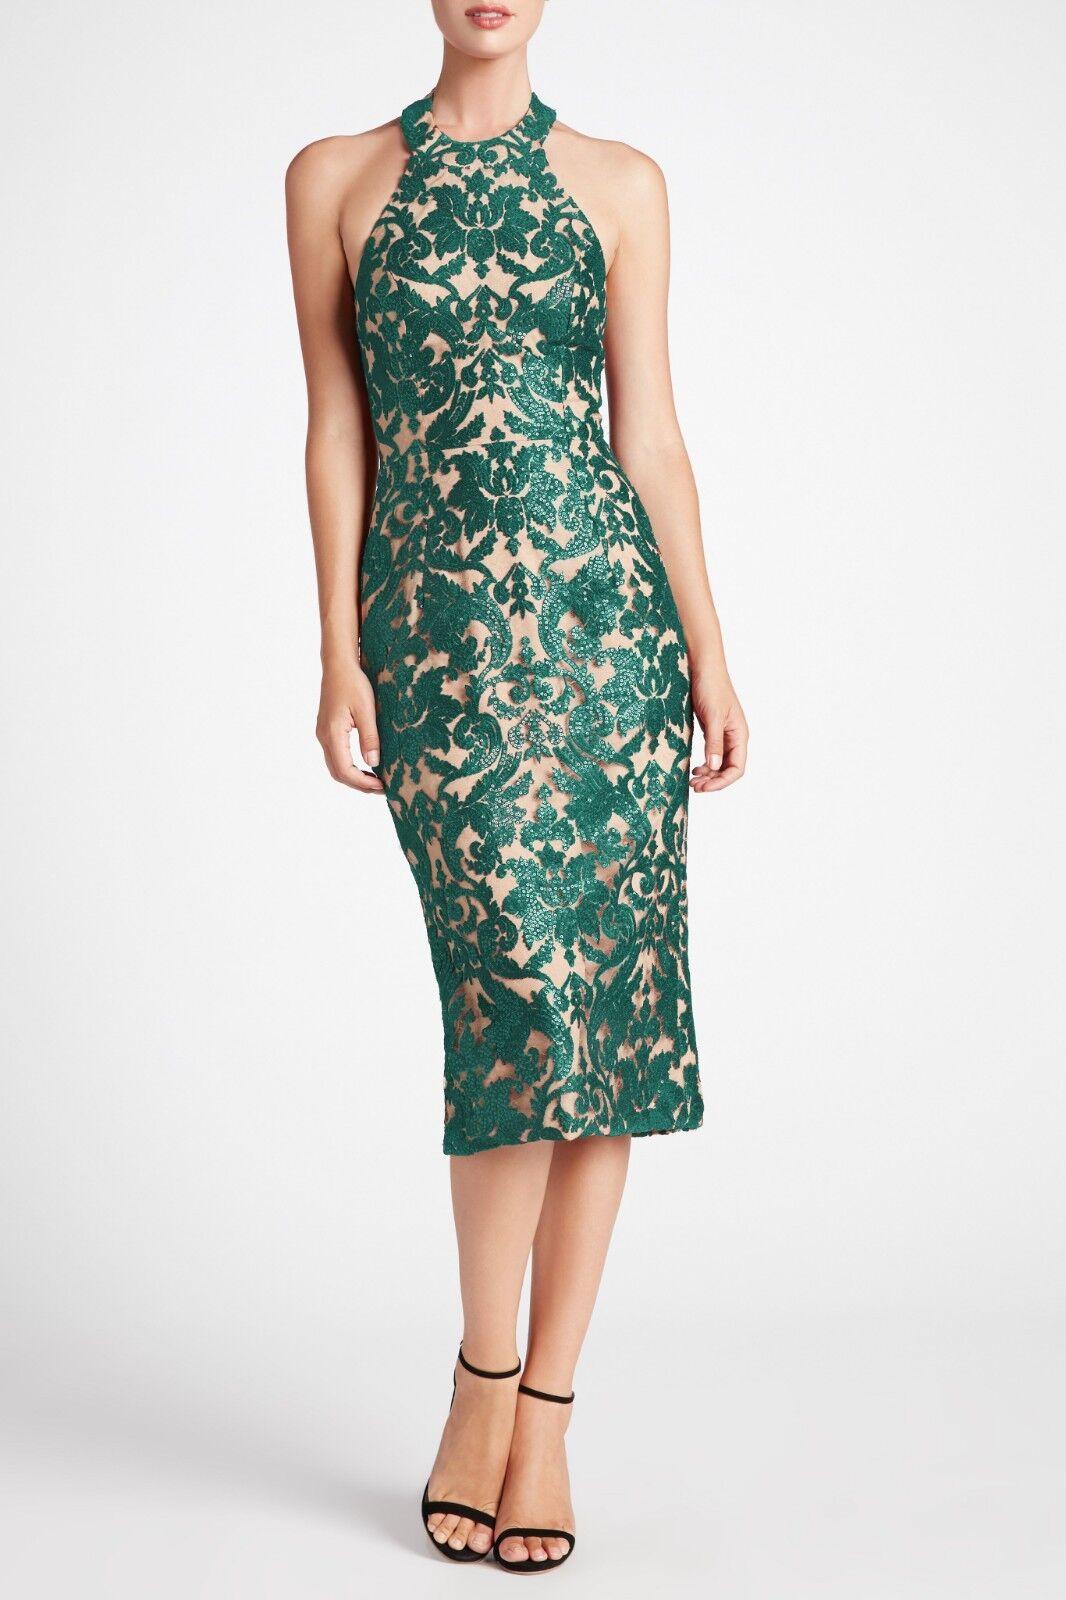 NEW DRESS the POPULATION Emerald Green Nude Sequin Lace Cassie Halter Midi M 8